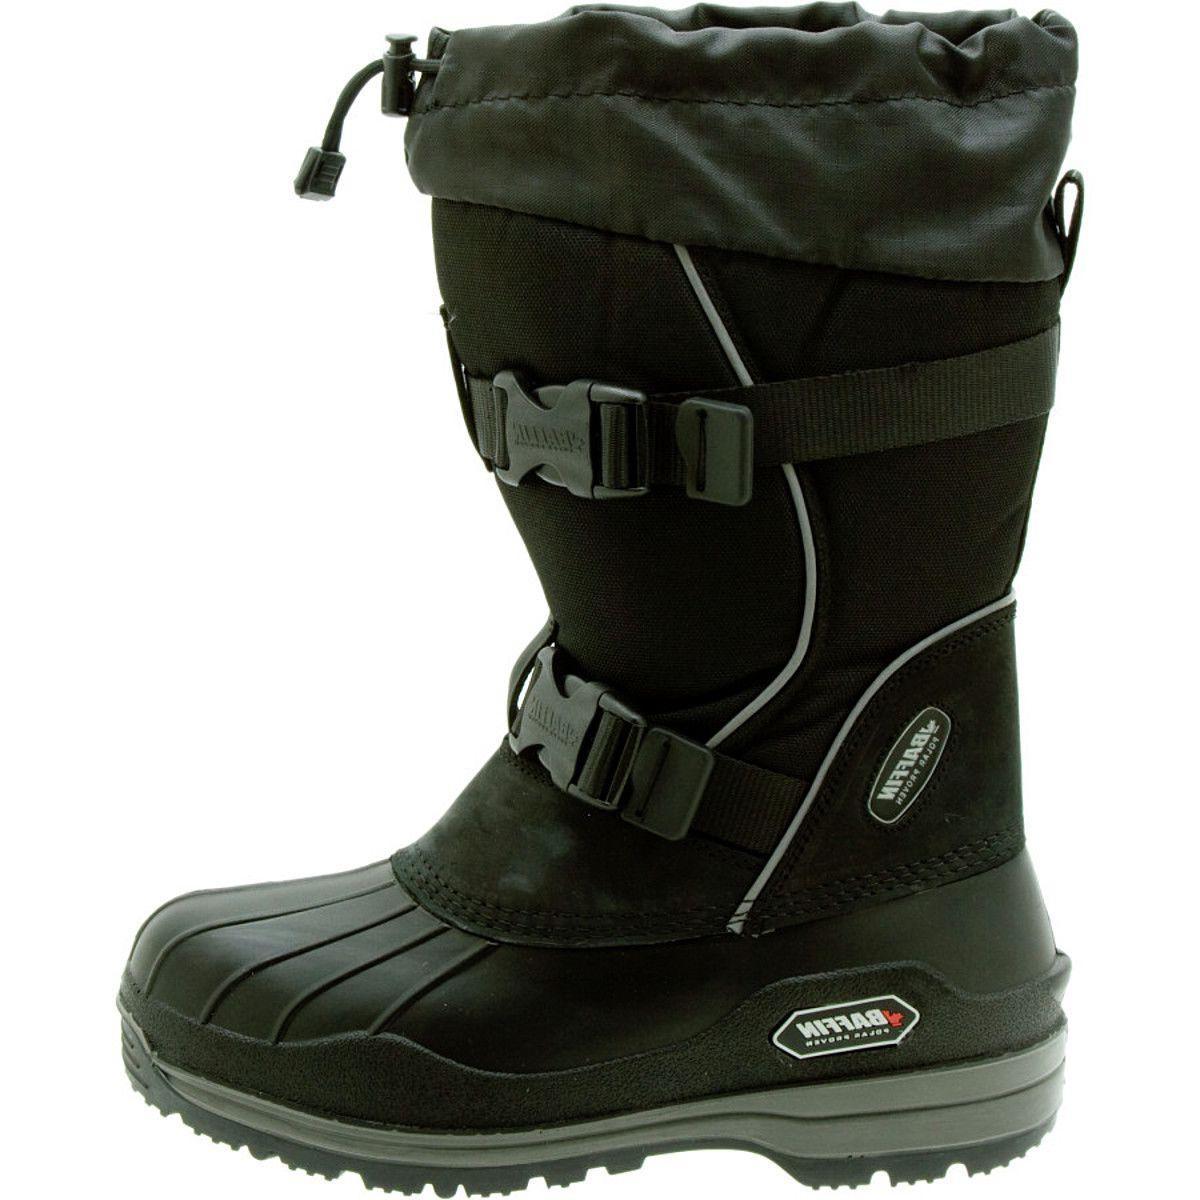 impact winter boot